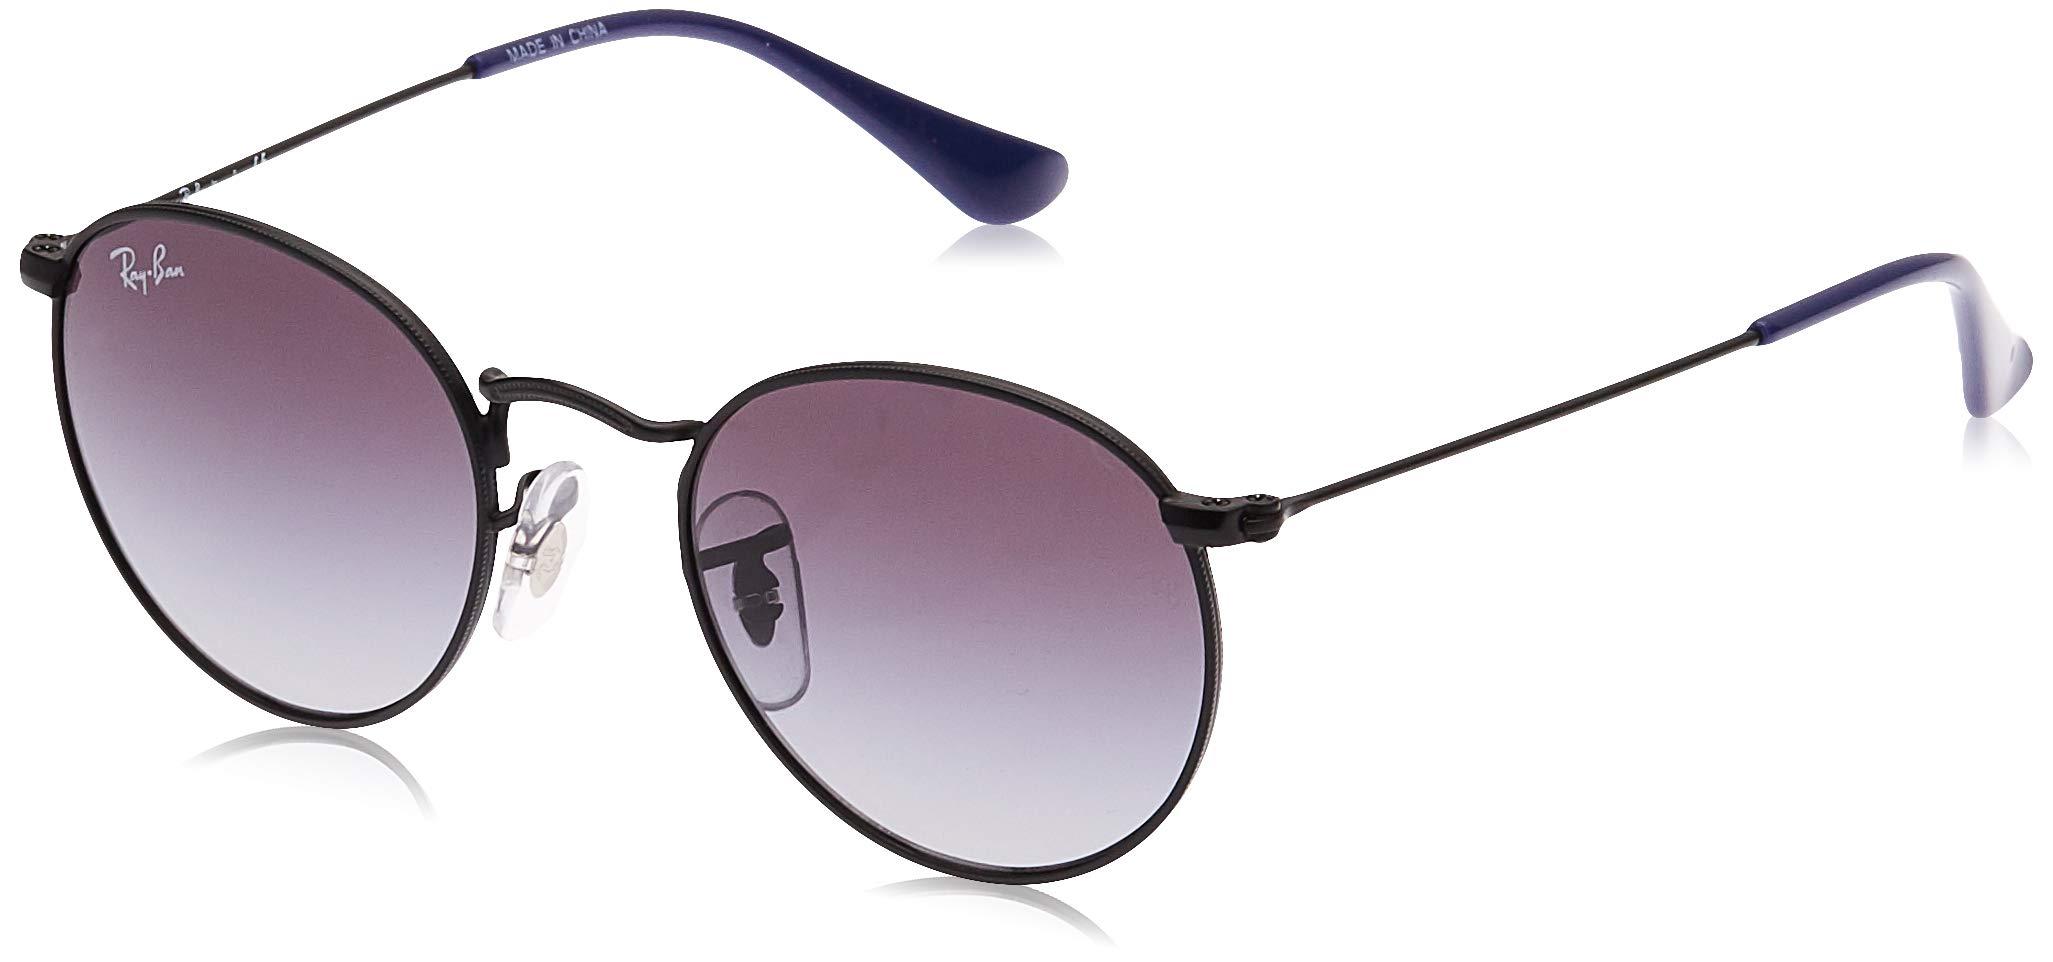 RAY-BAN JUNIOR Kids' RJ9547S Round Metal Kids Sunglasses, Matte Black/Light Grey Gradient Dark Grey, 44 mm by RAY-BAN JUNIOR